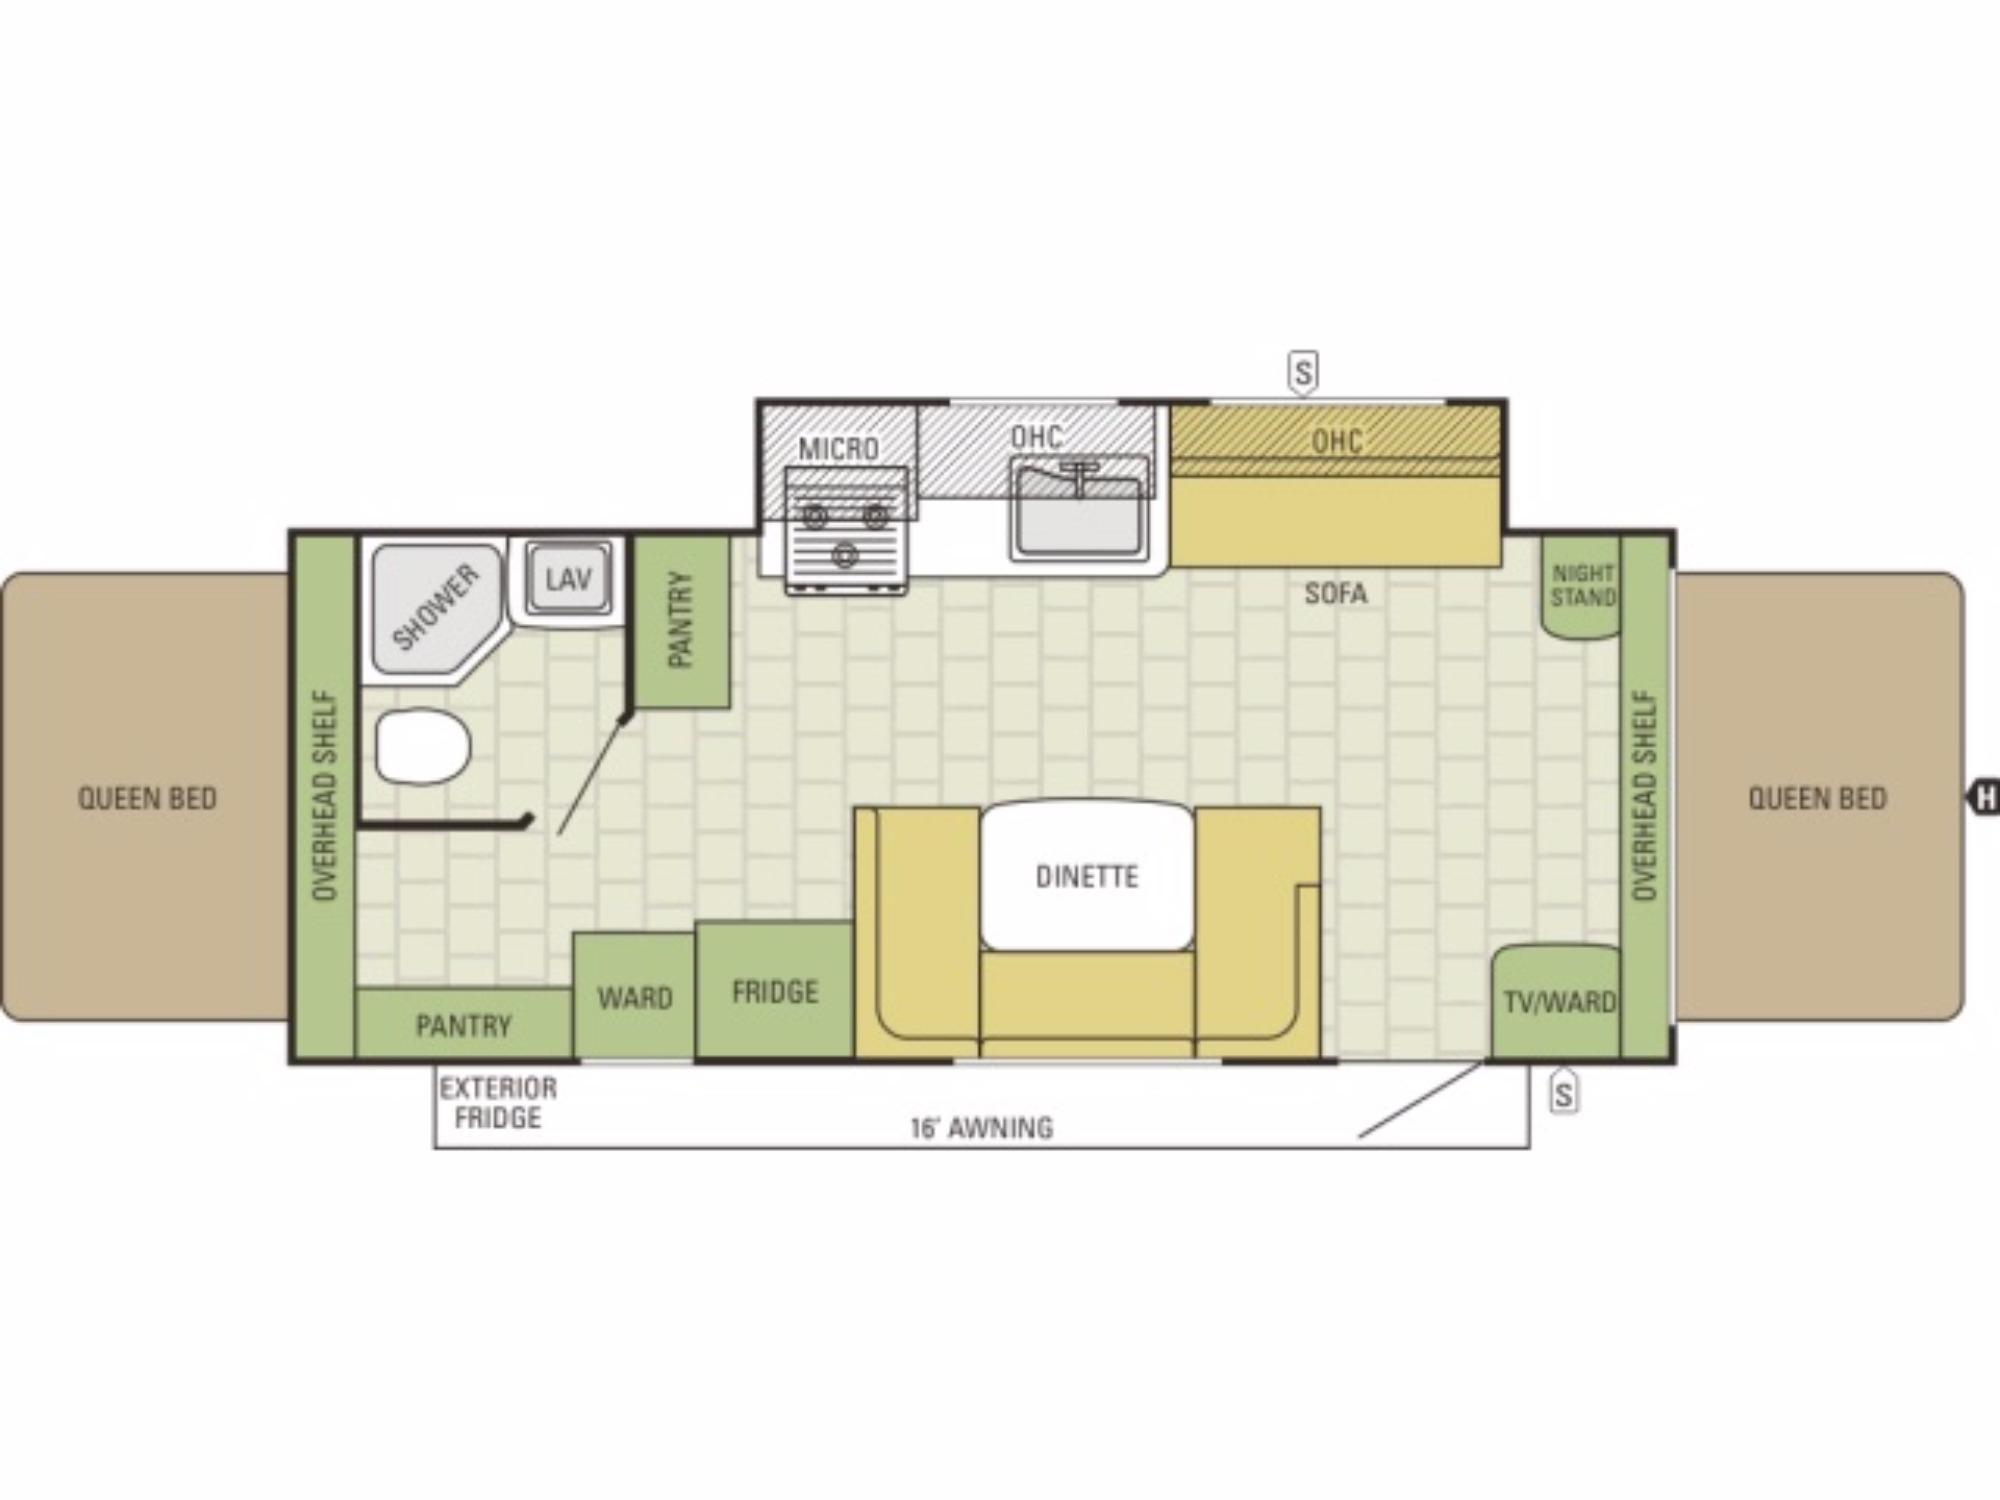 View Floor Plan for 2016 STARCRAFT TRAVEL STAR 227CKS